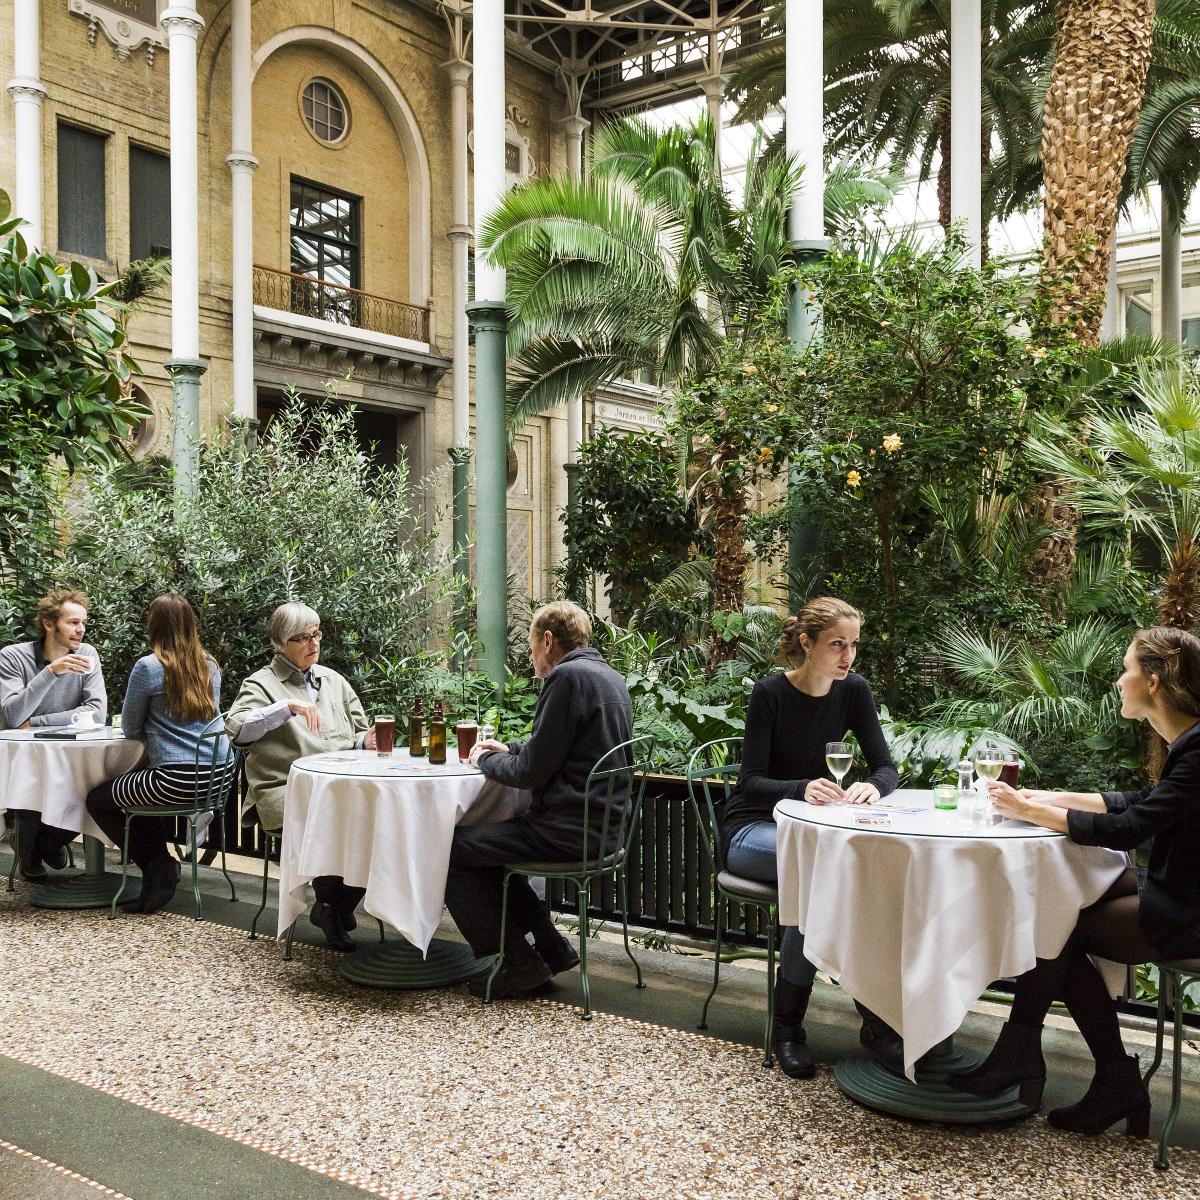 Ny Carlsberg Glyptotek Kopenhagen_Café im Wintergarten